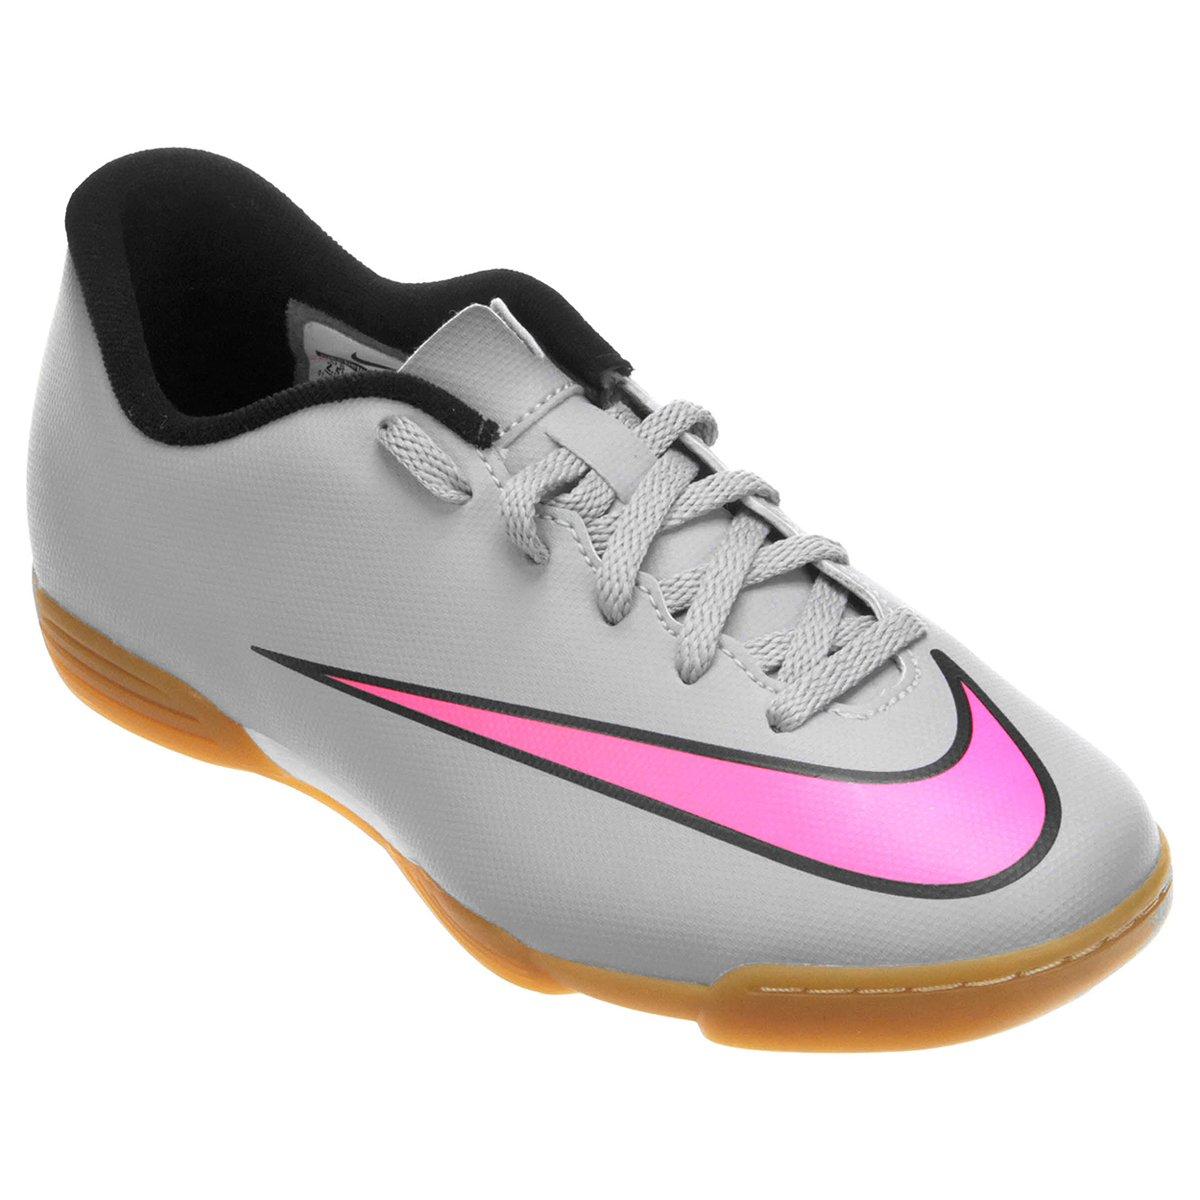 672a72c6b4 Chuteira Futsal Infantil Nike Mercurial Vortex 2 IC - Compre Agora ...